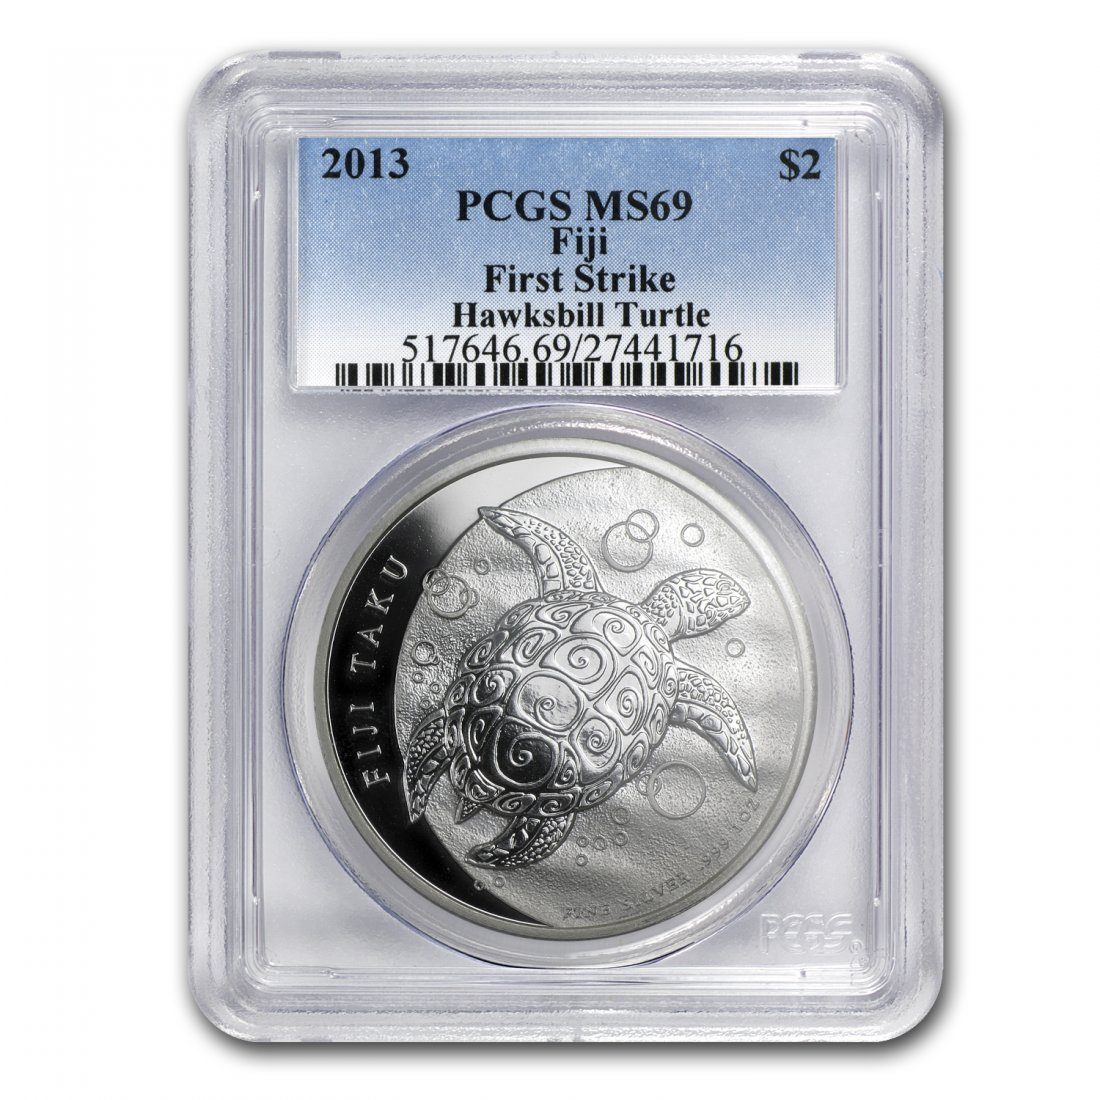 2013 1 oz Silver $2 Fiji Taku Coin - MS-69 First Strike